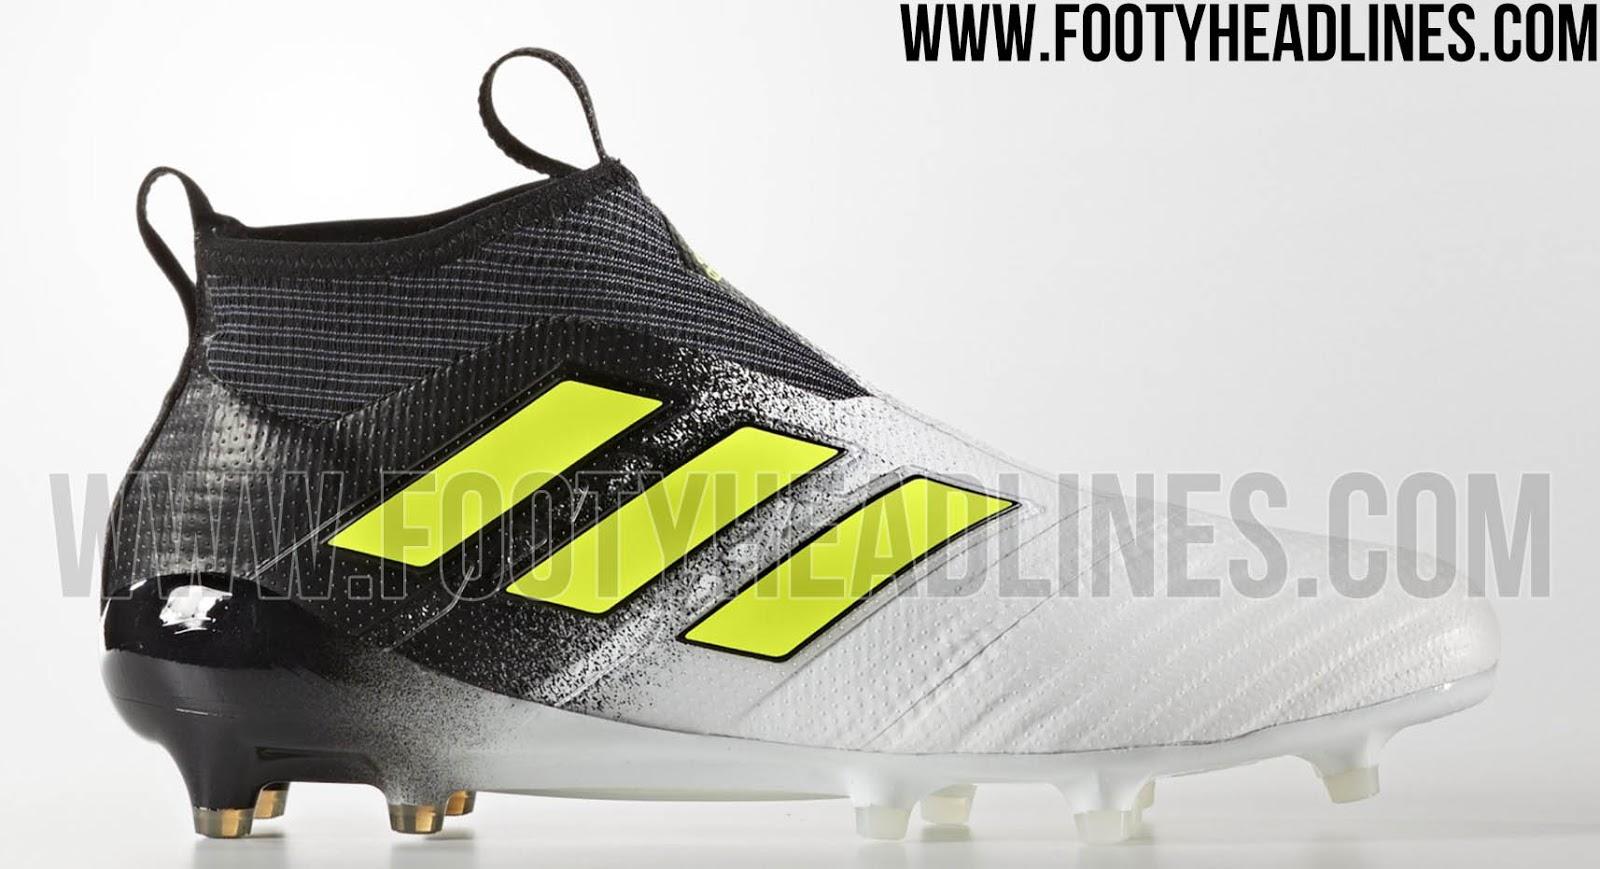 huge discount 9dbb4 affc3 ... Adidas Ace 17 Dust Storm Adidas X ...